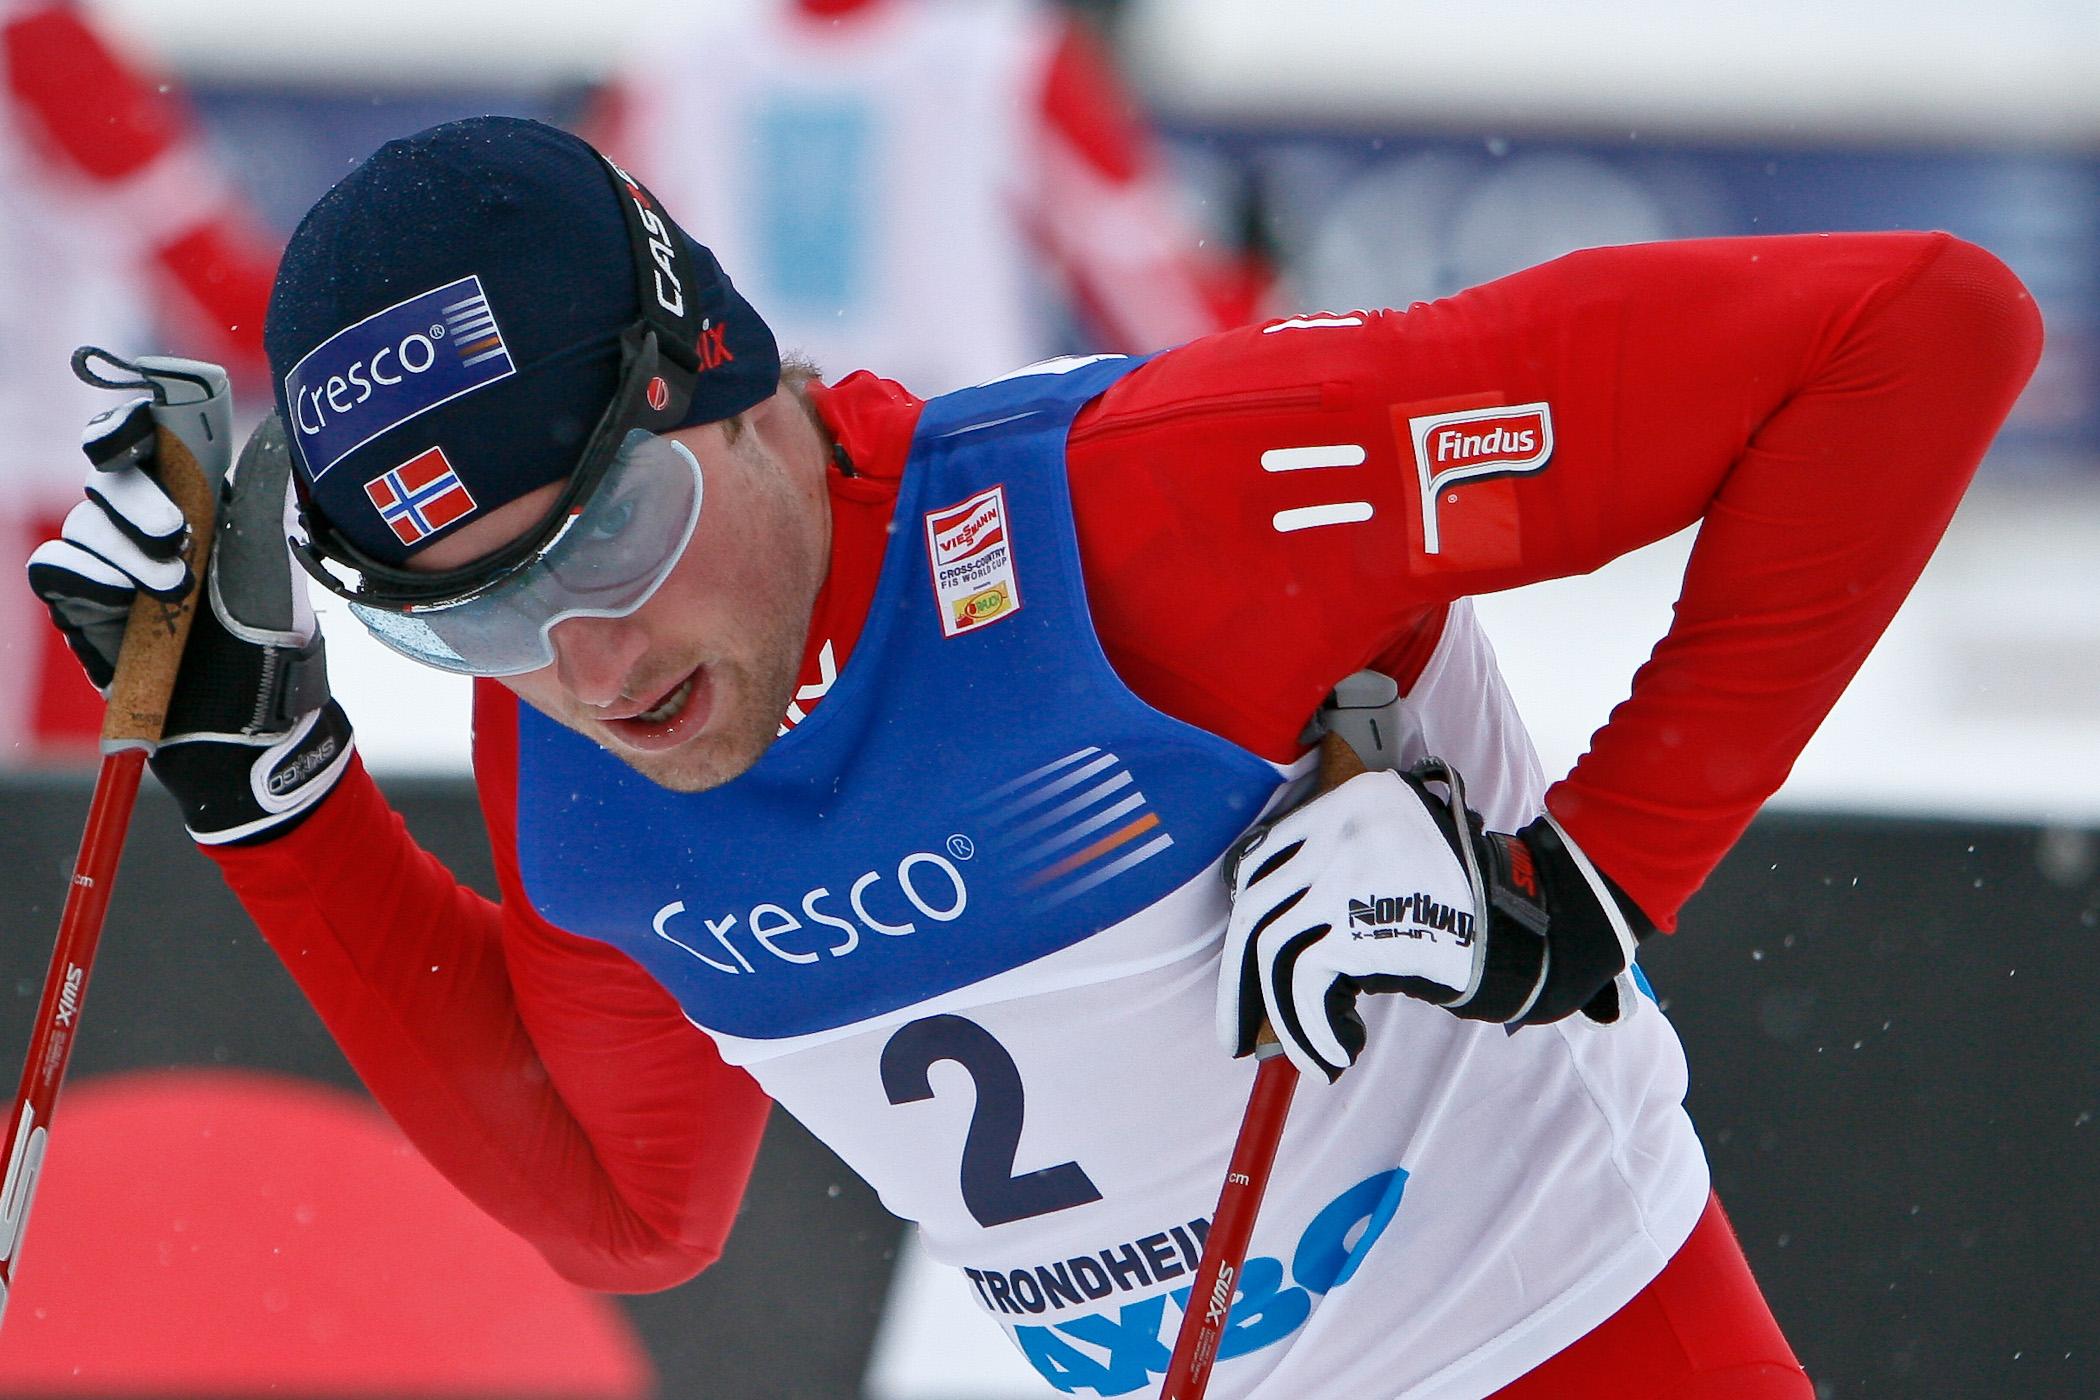 Petter Northug Image